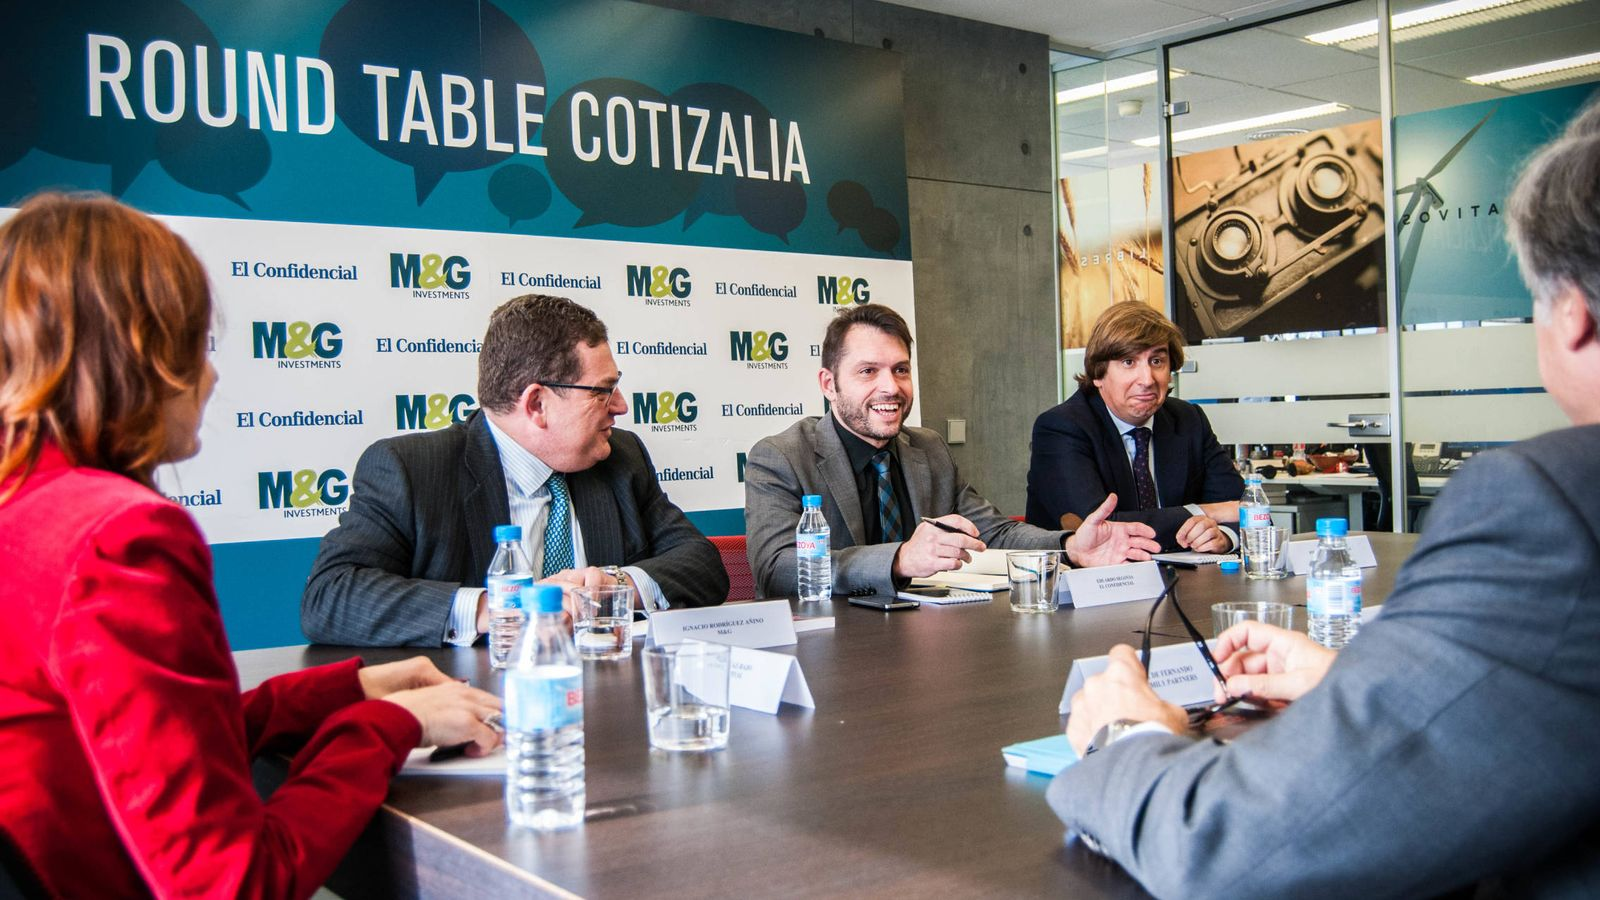 Foto: Round Table de Cotizalia. (Fotos: Carmen Castellón)